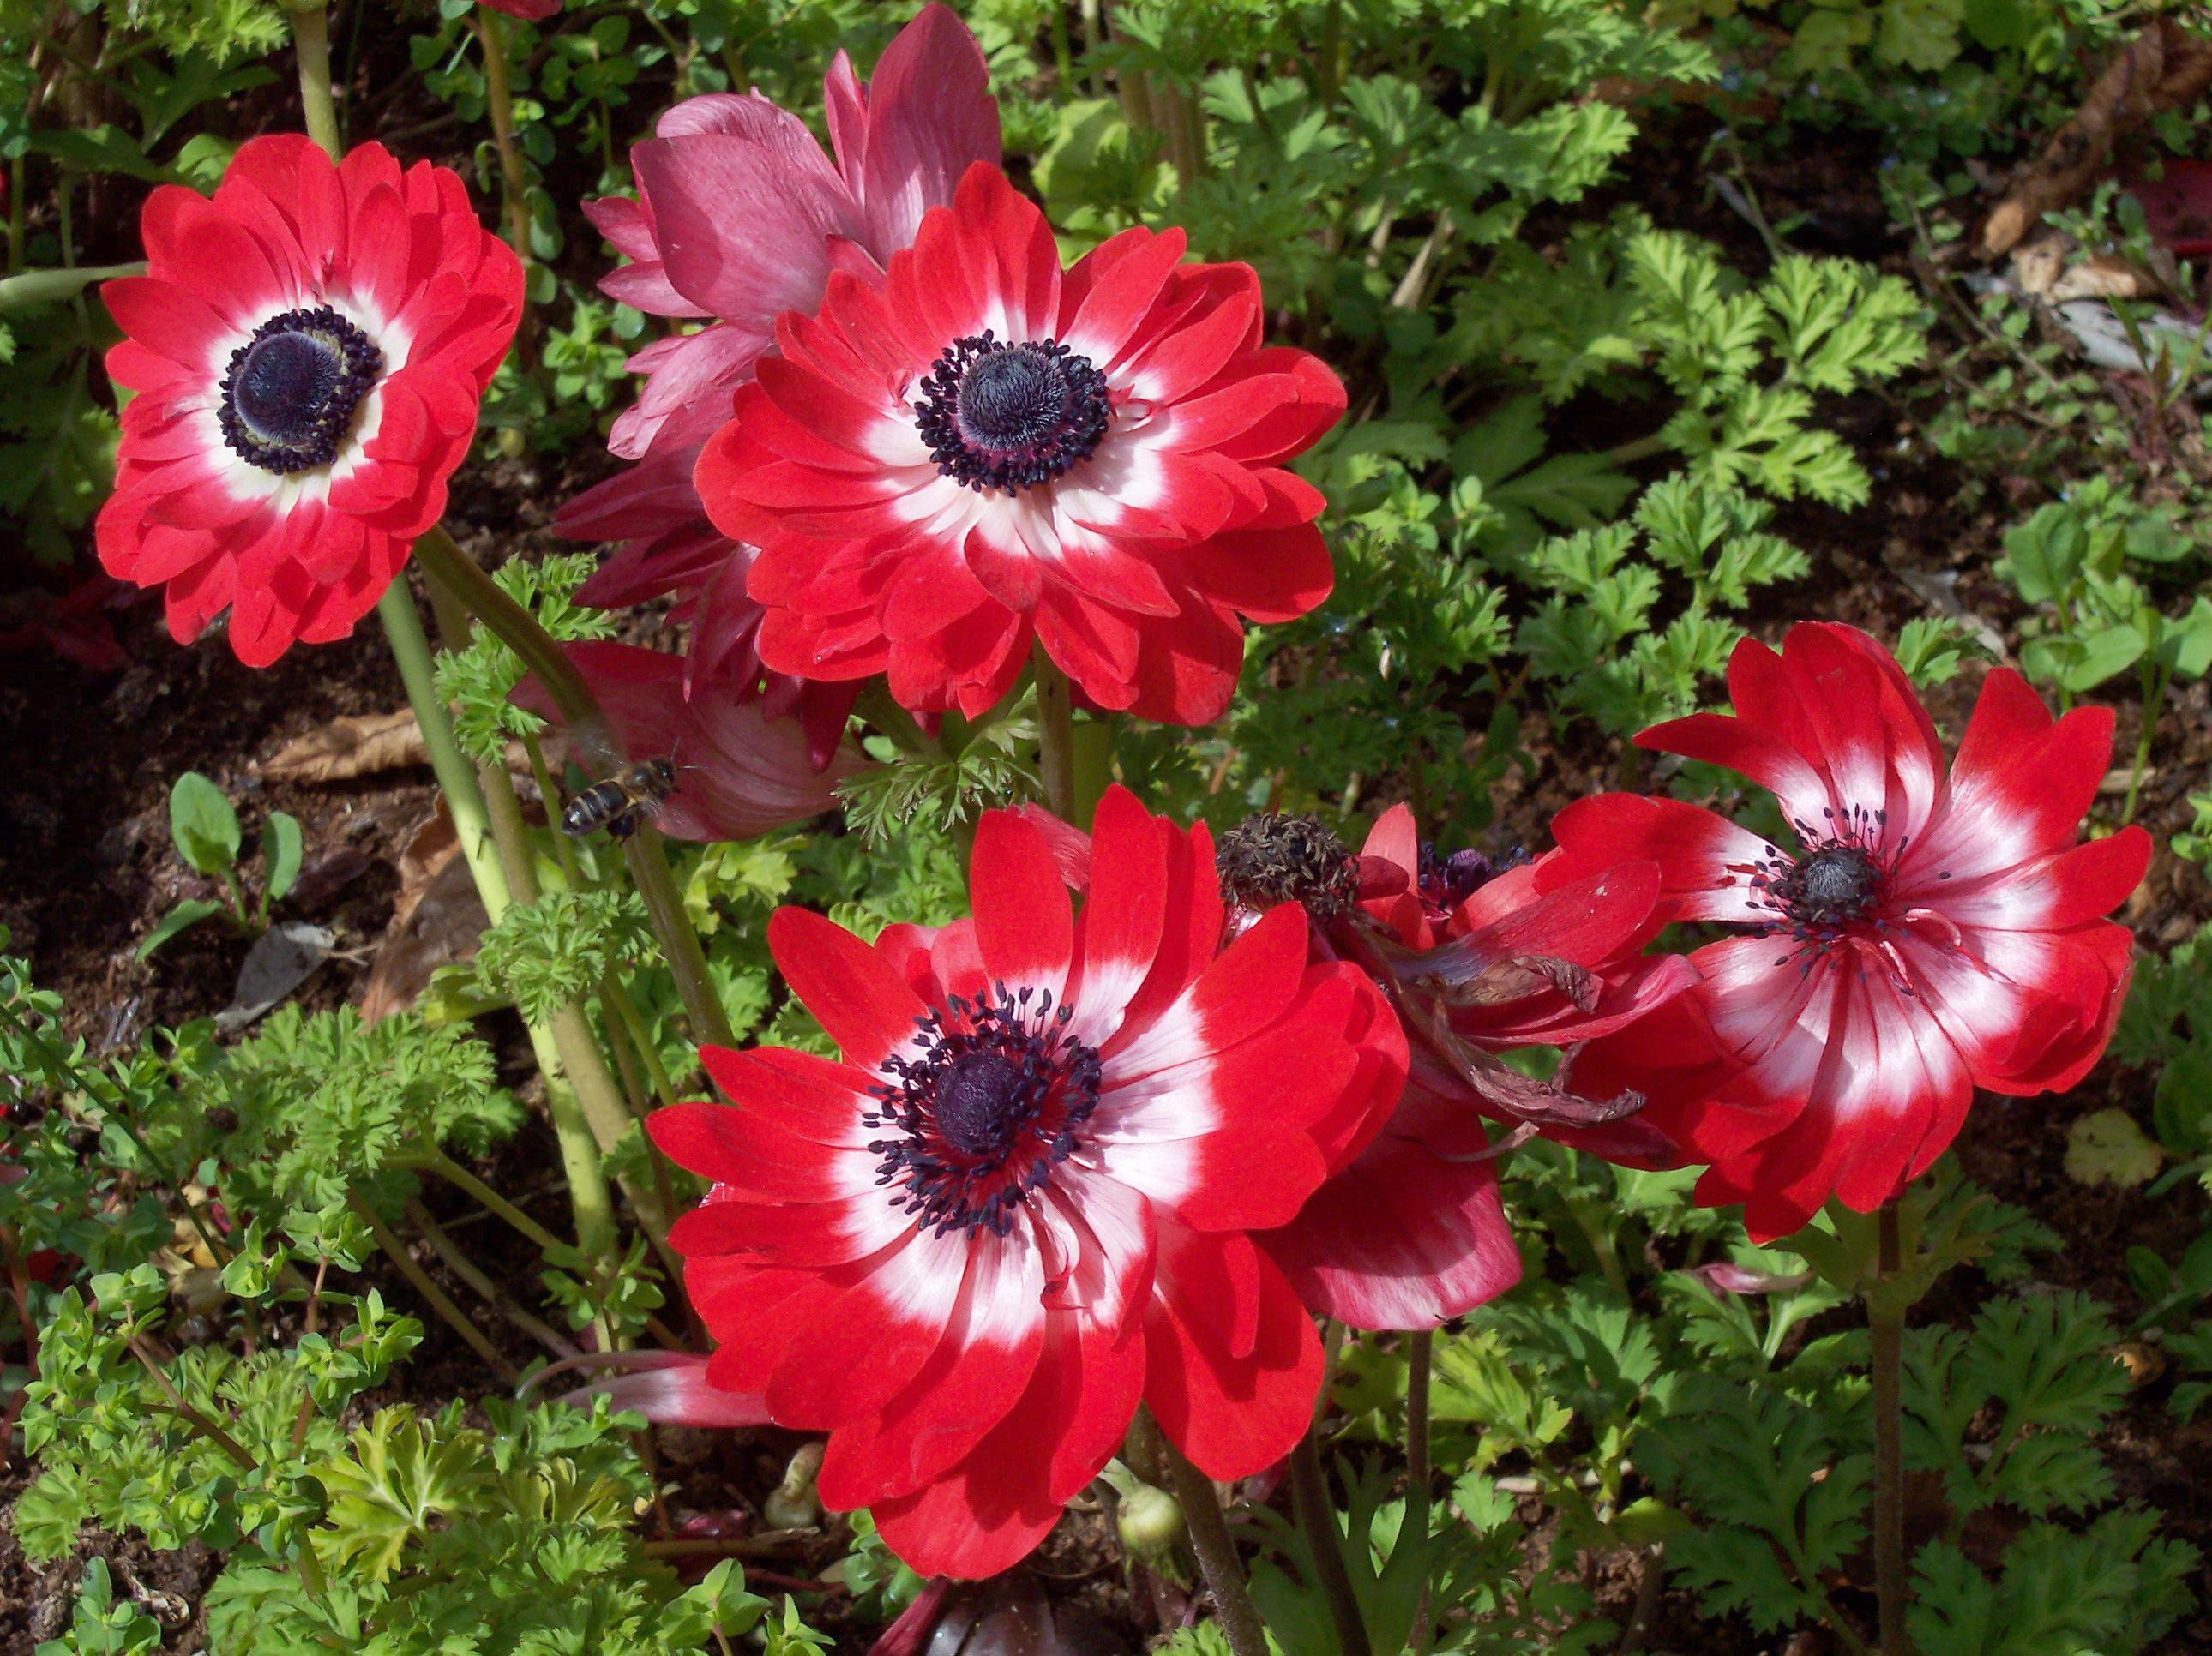 In the garden of beautiful flowers anemone wallpapers and images in the garden of beautiful flowers anemone wallpapers and images wallpapers pictures photos izmirmasajfo